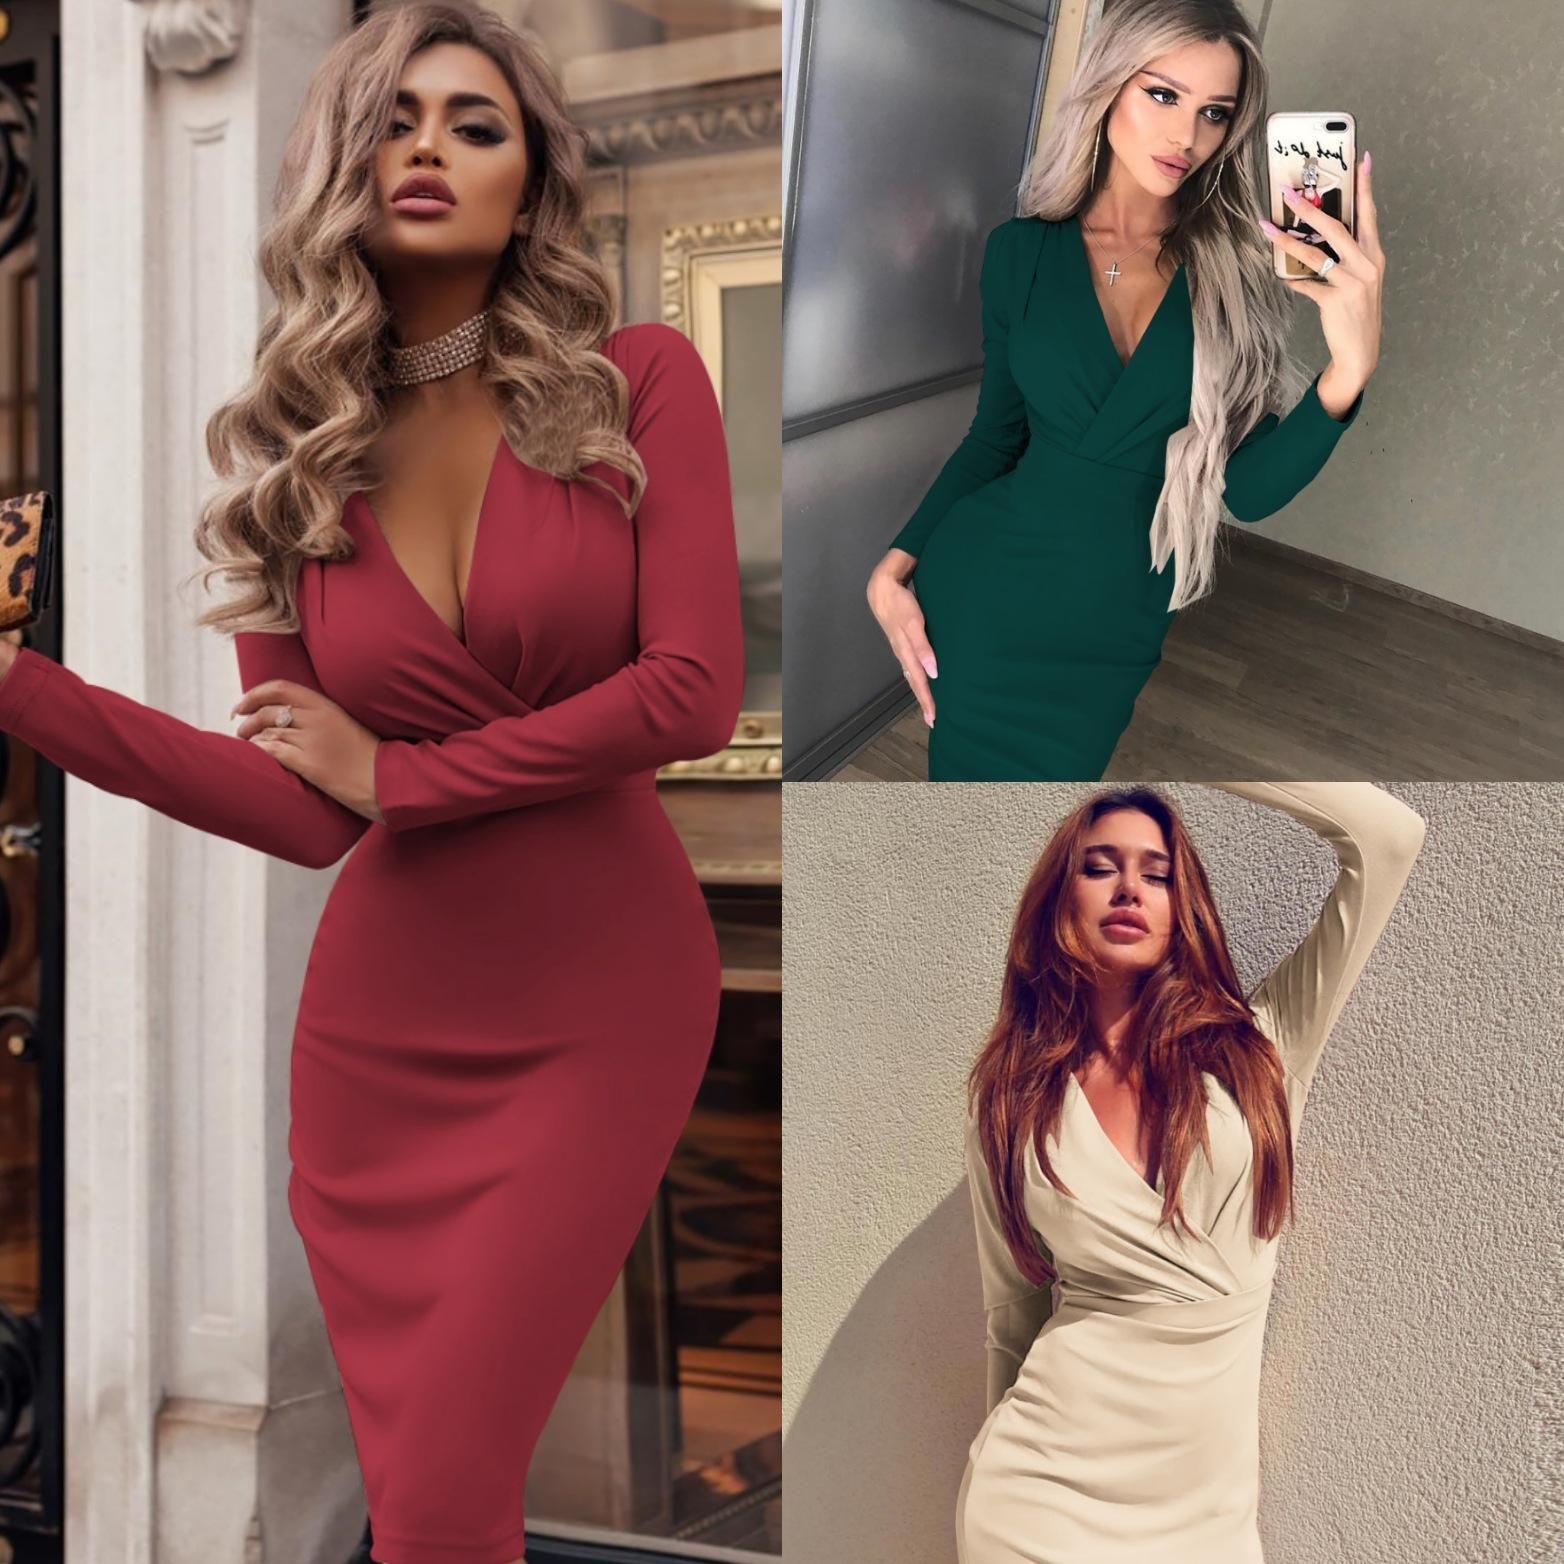 c23da111d5a New Spring Long Sleeve Solid Bodycon Party Dress Sexy Women Deep V Neck  Wrap Dress Elegant Knee Length Pencil Dresses S XXL Dress For Cocktail  Party Long ...